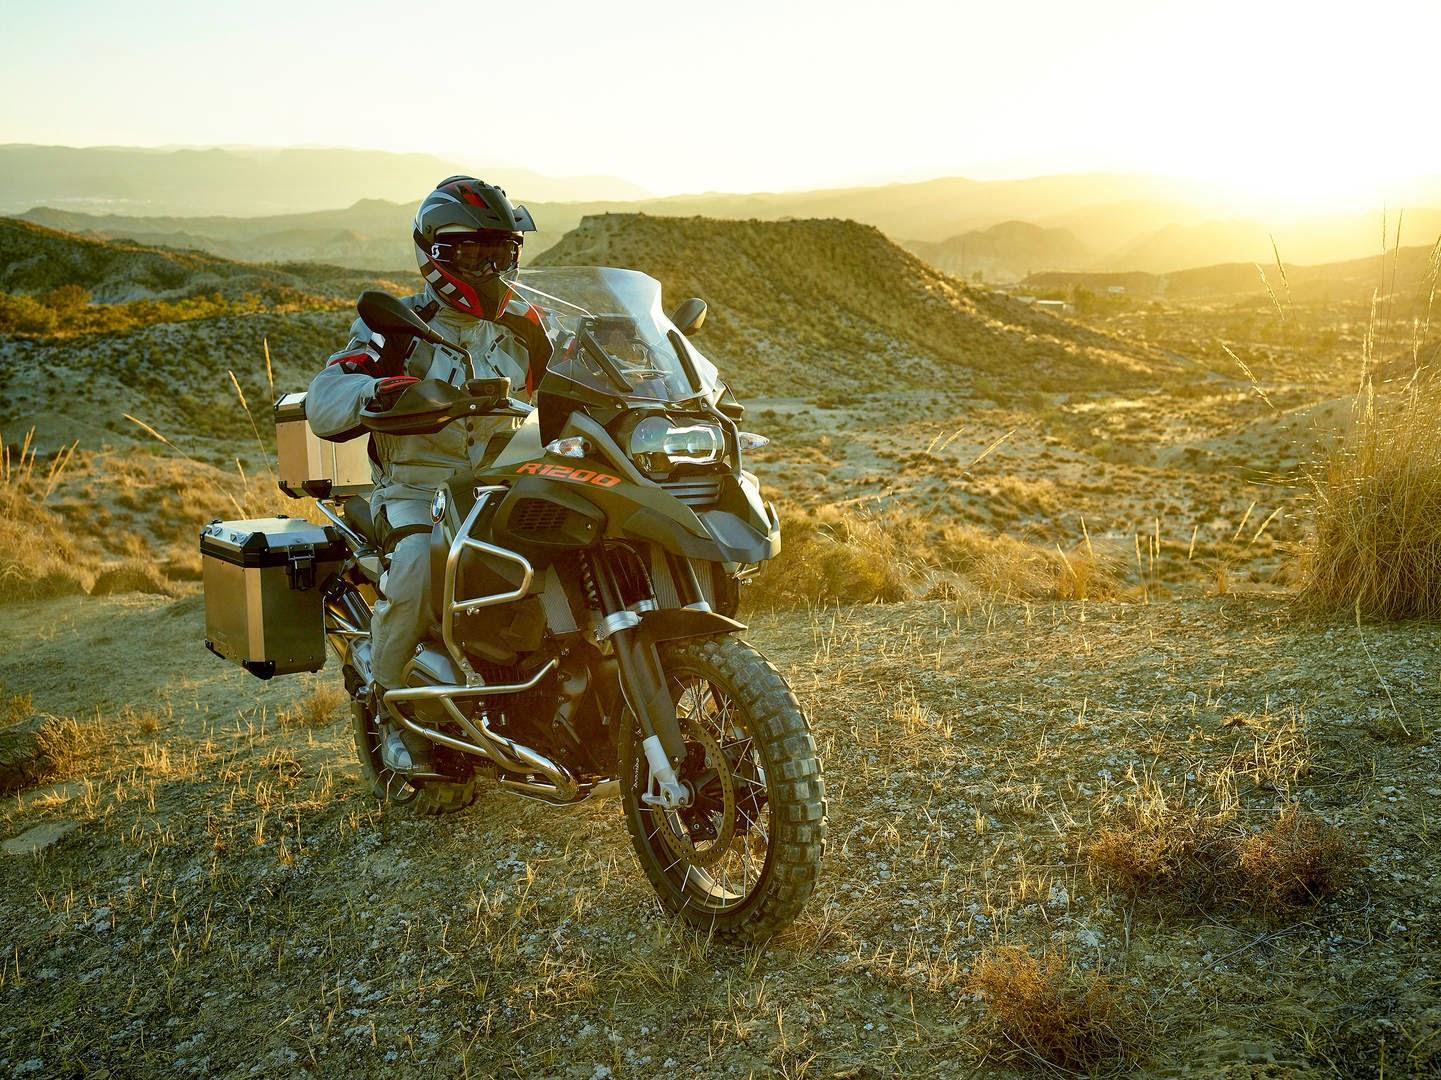 The BMW 1200 GS, World Travel Adventure